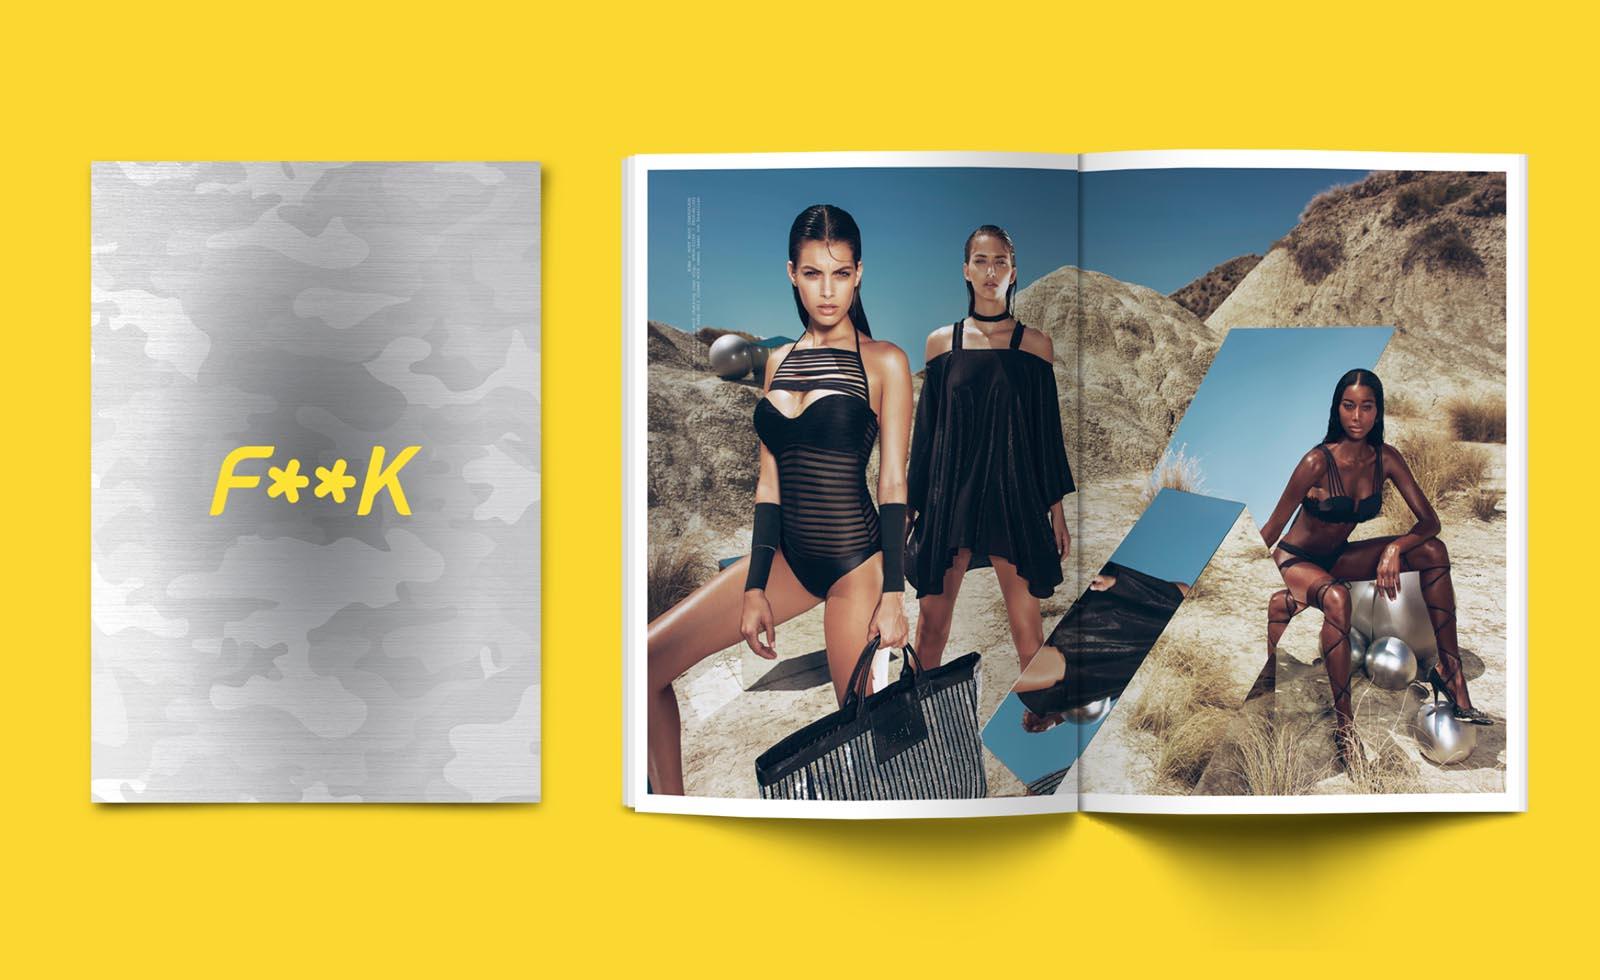 effek F**K rebranding brand brochure pitscheider maggipinto